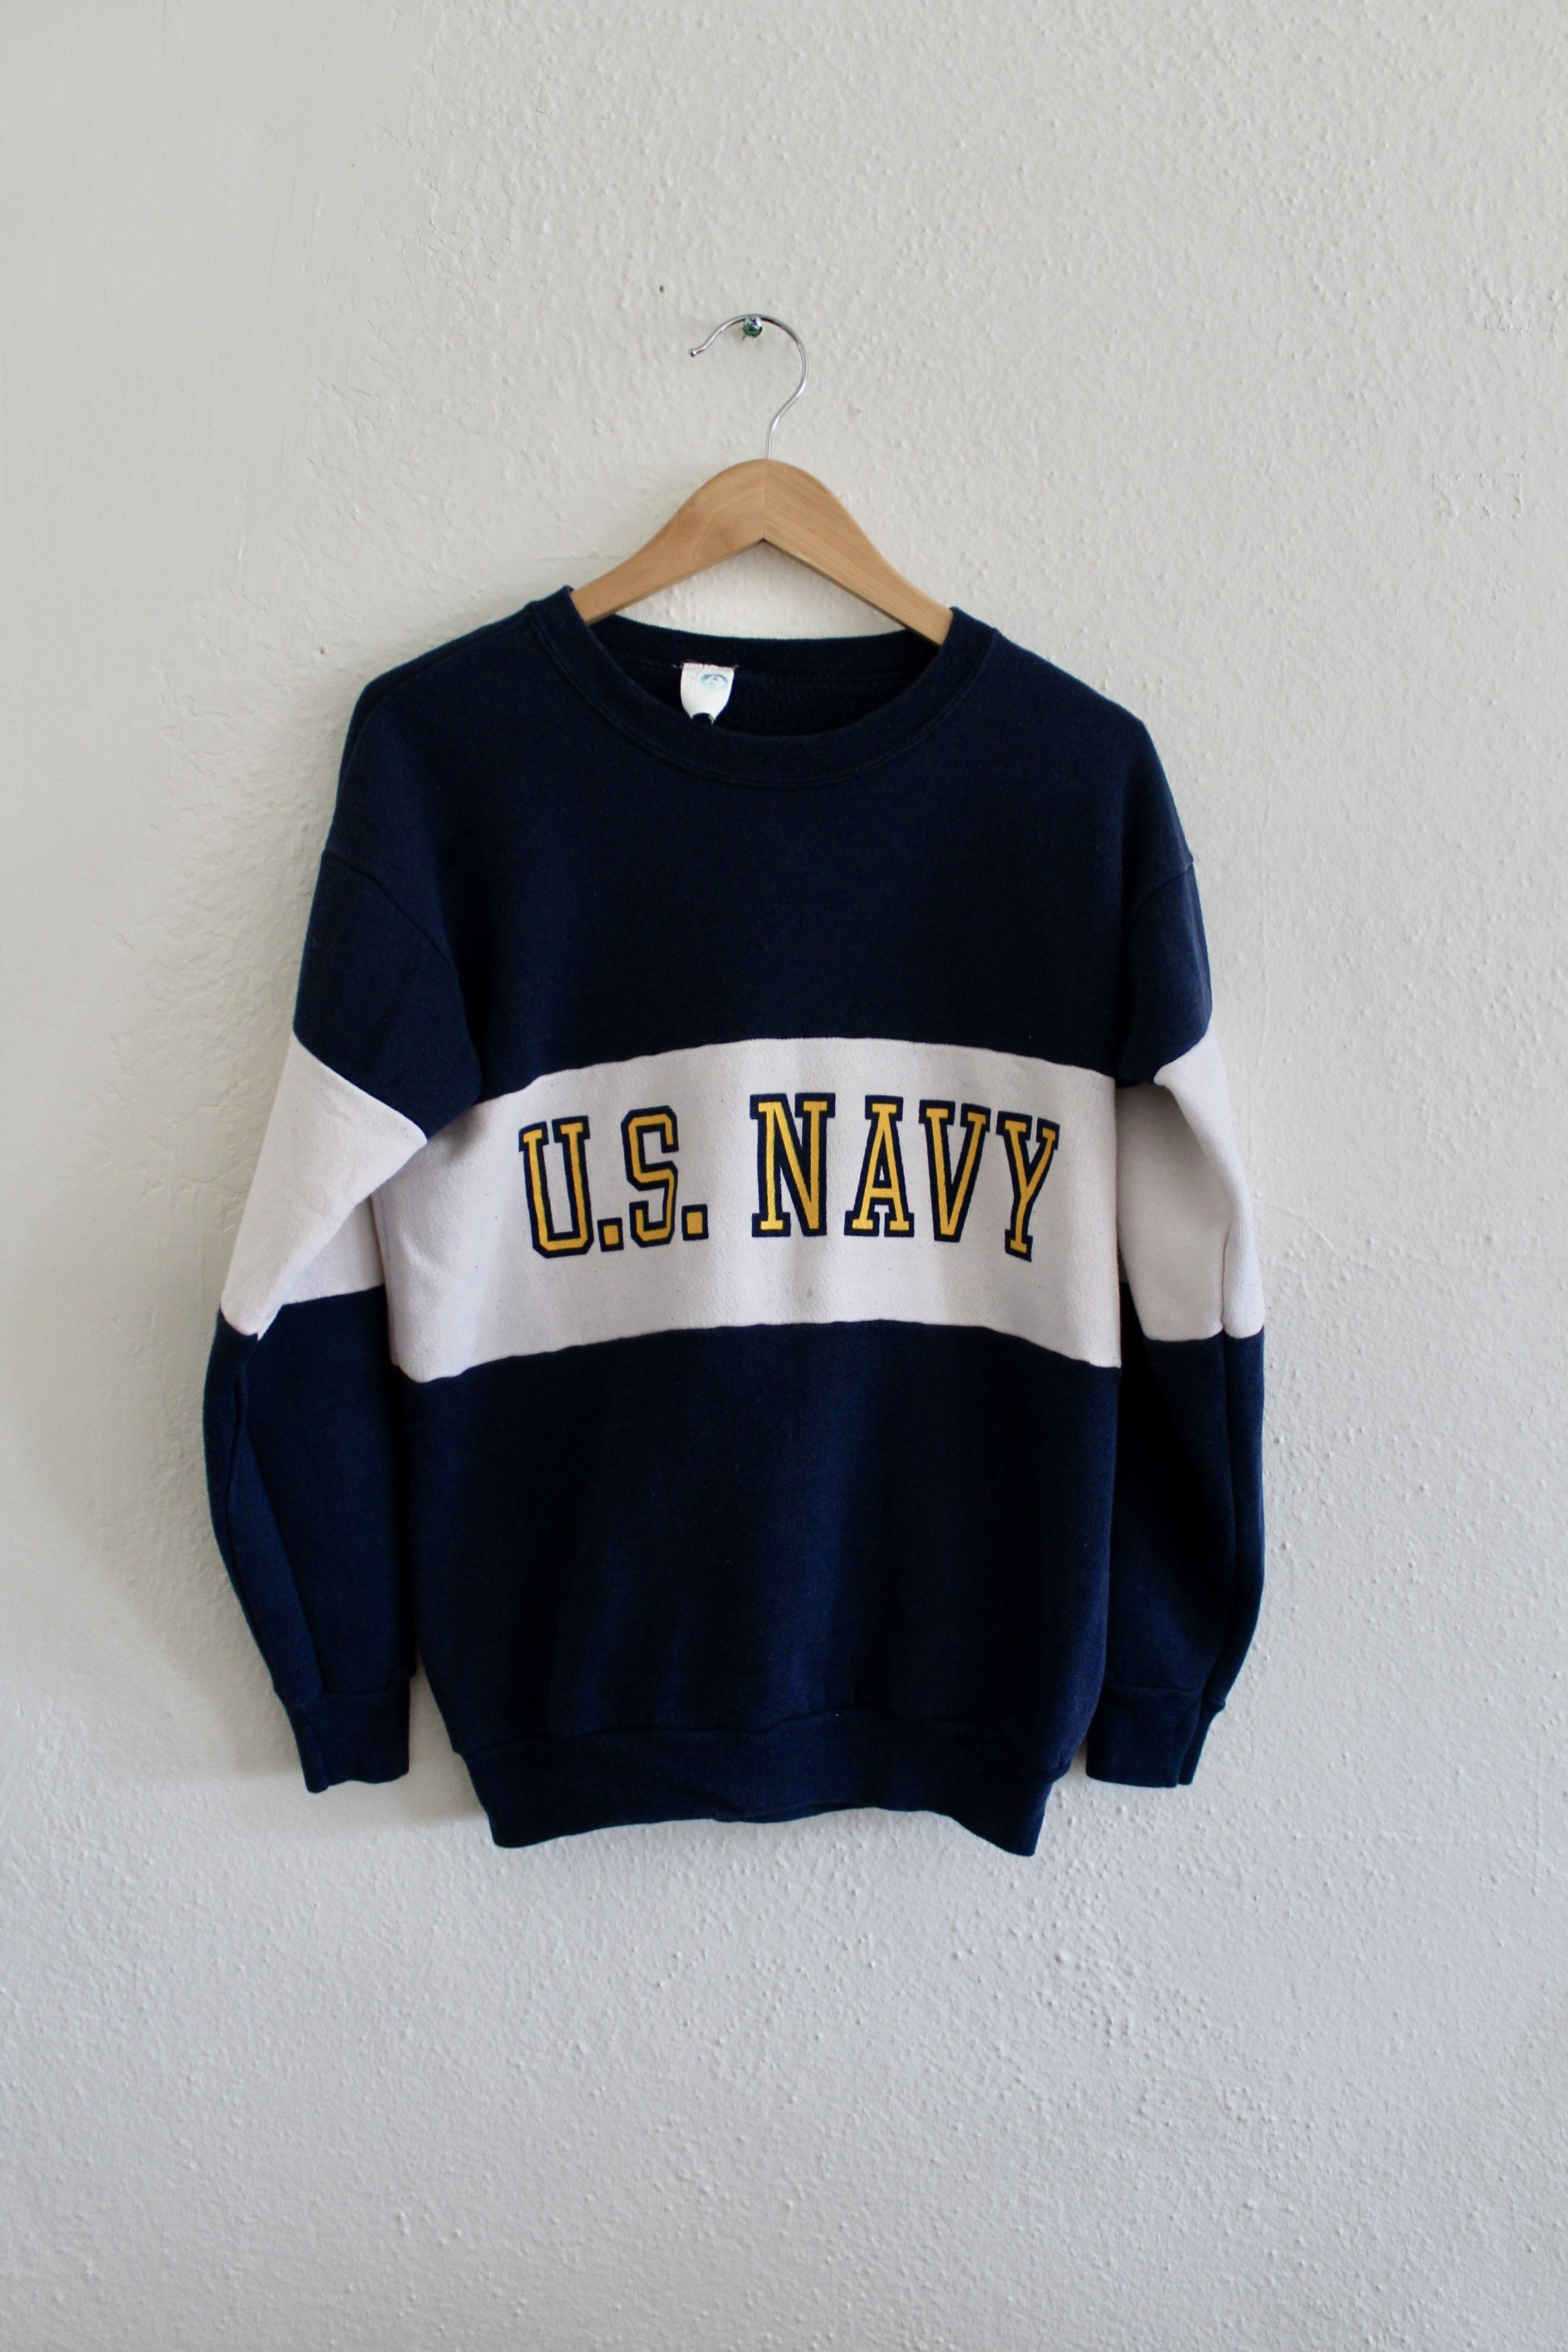 U S Navy Vintage Sweatshirt Vintage Crewneck Sweatshirt Etsy Sweatshirts Vintage Crewneck Sweatshirt Vintage Sweatshirt [ 5184 x 3456 Pixel ]